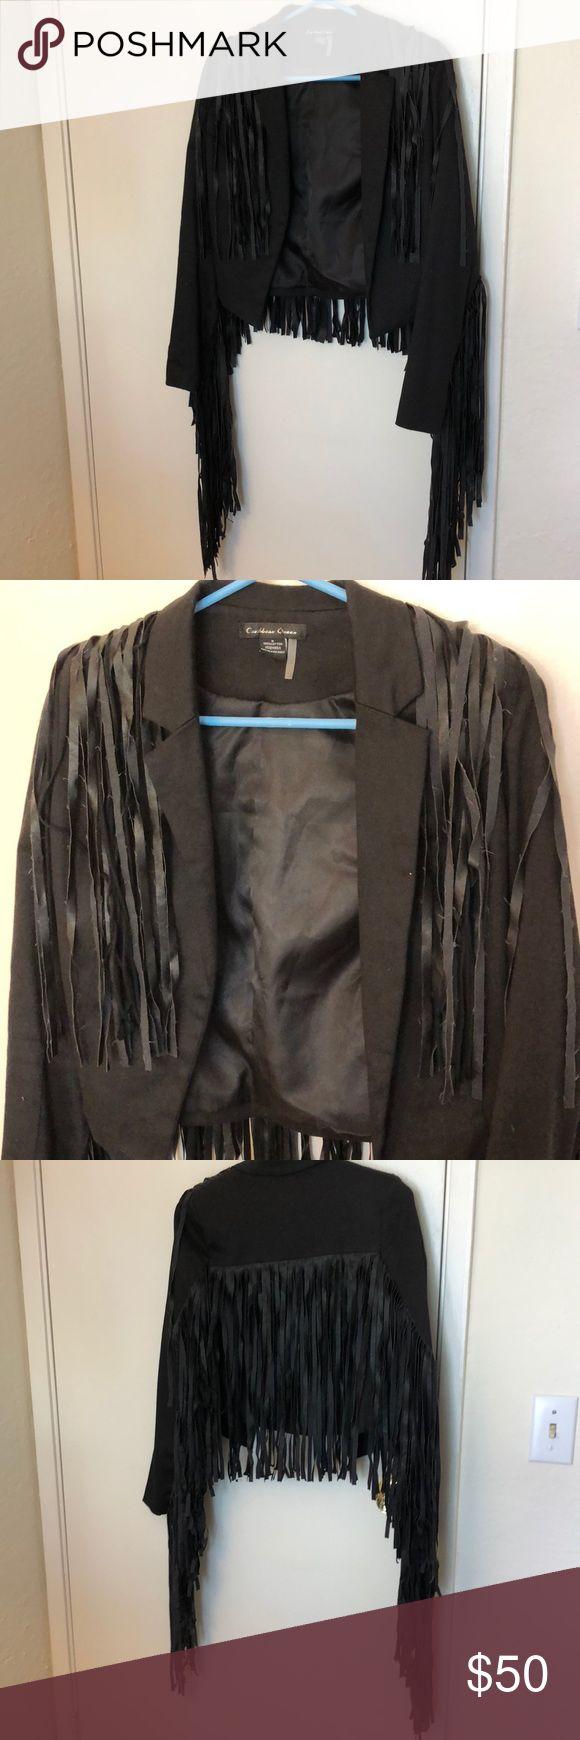 Caribbean queen leather fringe blazer jacket Caribbean queen leather fringe blazer jacket. 100% cotton size small caribbean queen Jackets & Coats Blazers